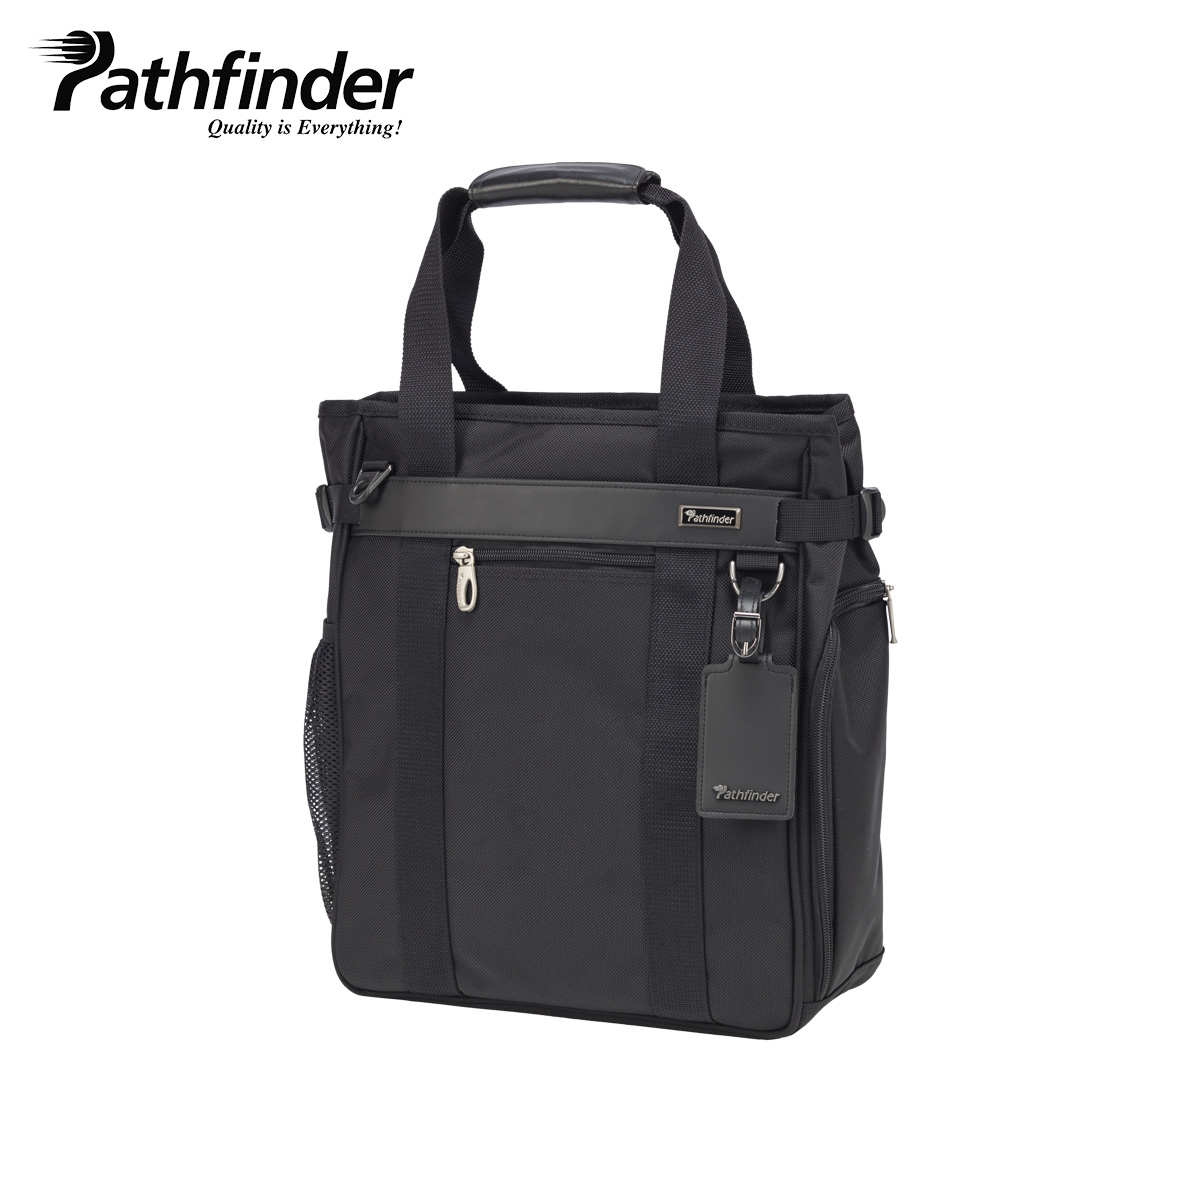 Pathfinder 3WAY REVOLUTION XT パスファインダー トート バッグ ビジネスバッグ リュック ブリーフケース ショルダー メンズ ブラック 黒 PF6810B